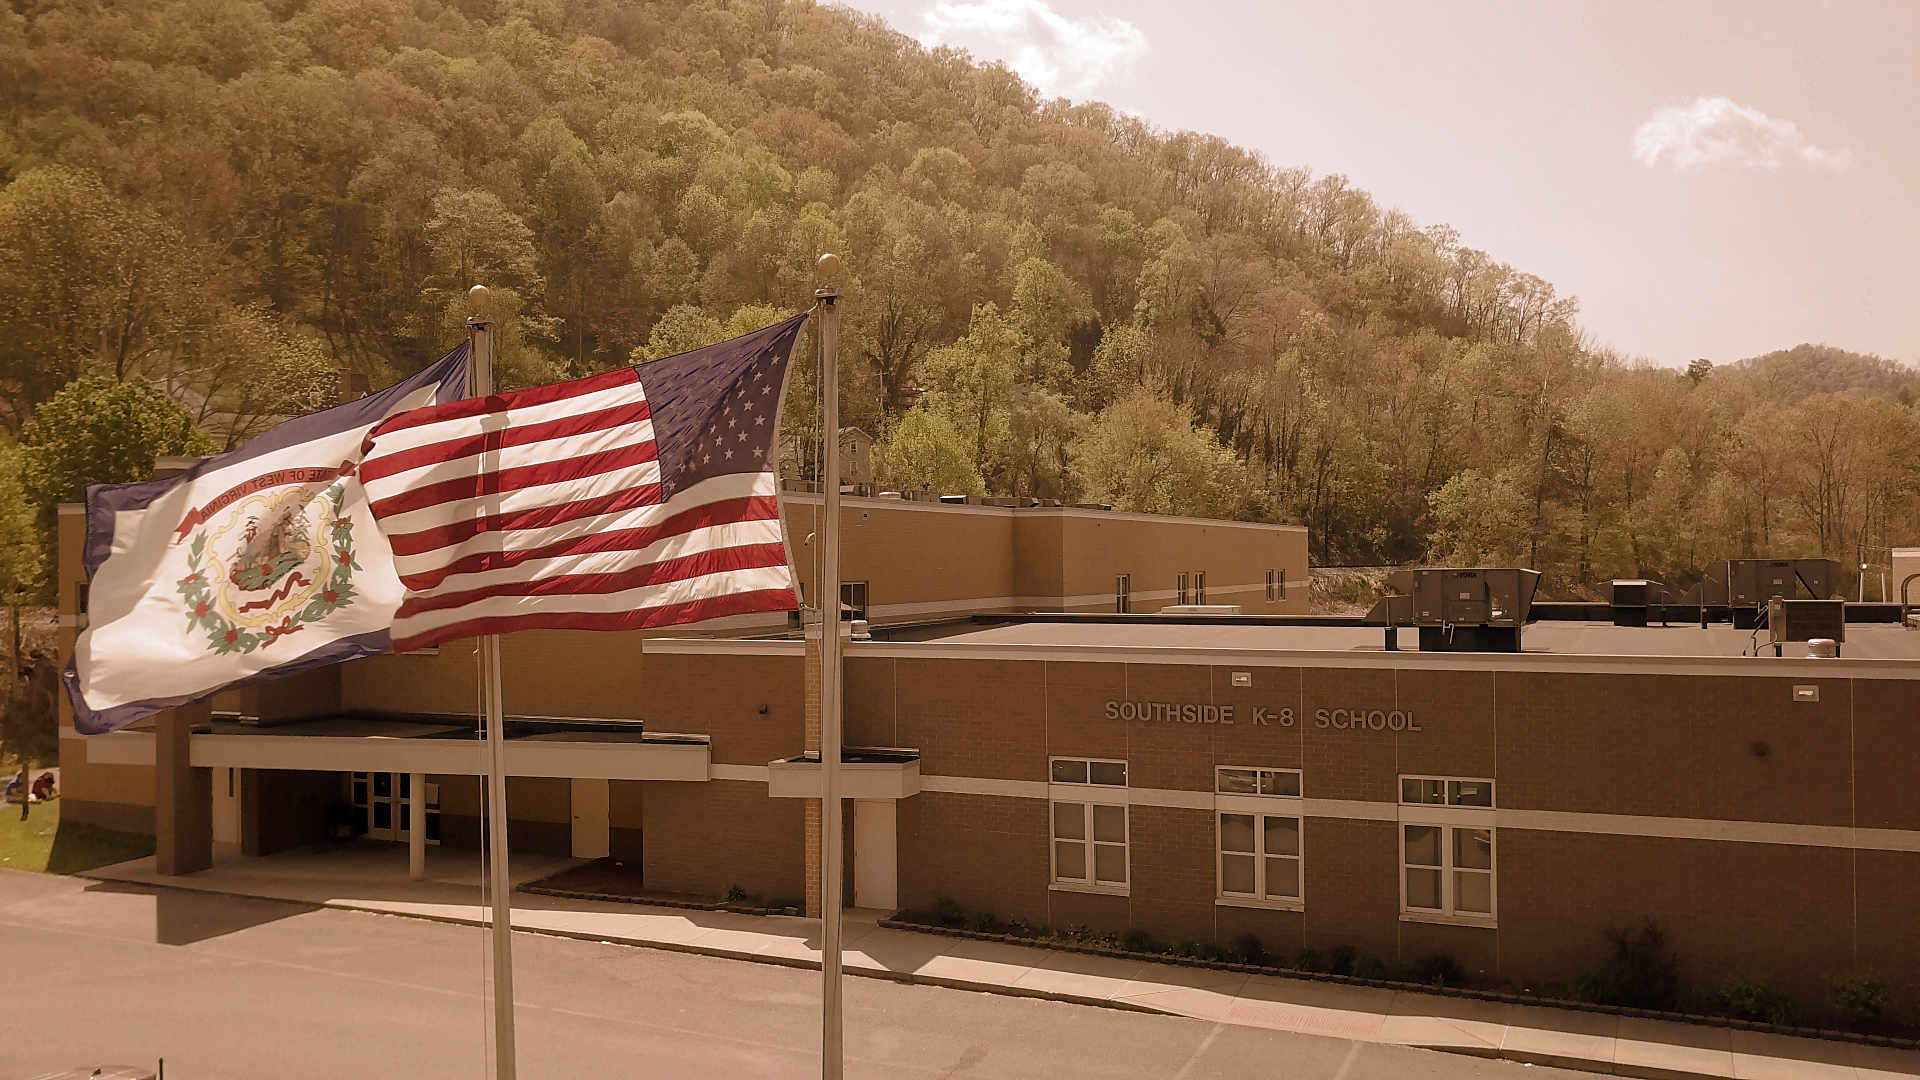 MCSP-Image-Schools-Southside-1